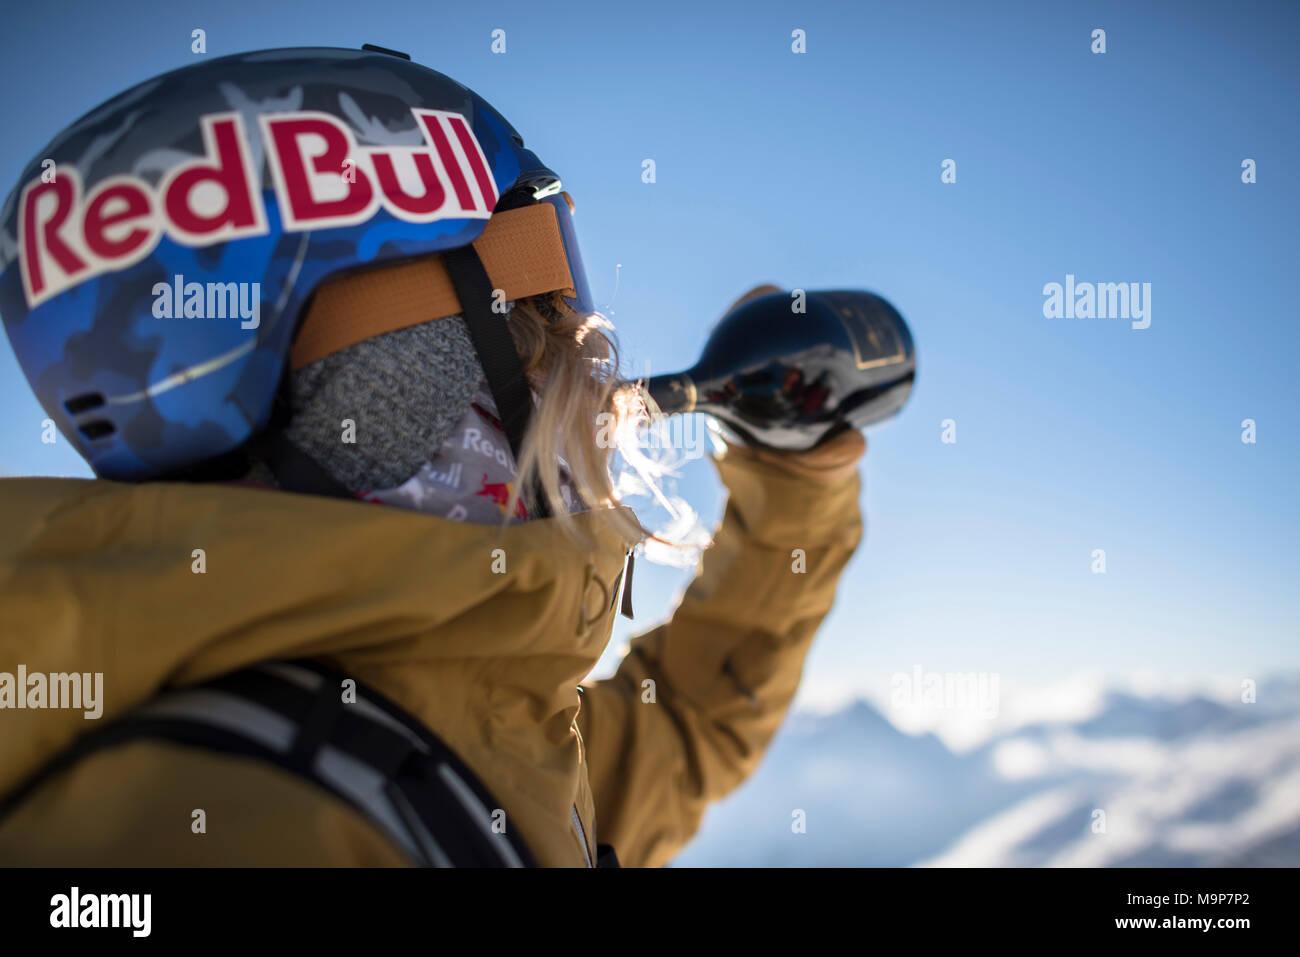 Skier in skiwear drinking wine from bottle, Monterosa Ski mountain resort in Gressoney, Aosta, Italy - Stock Image